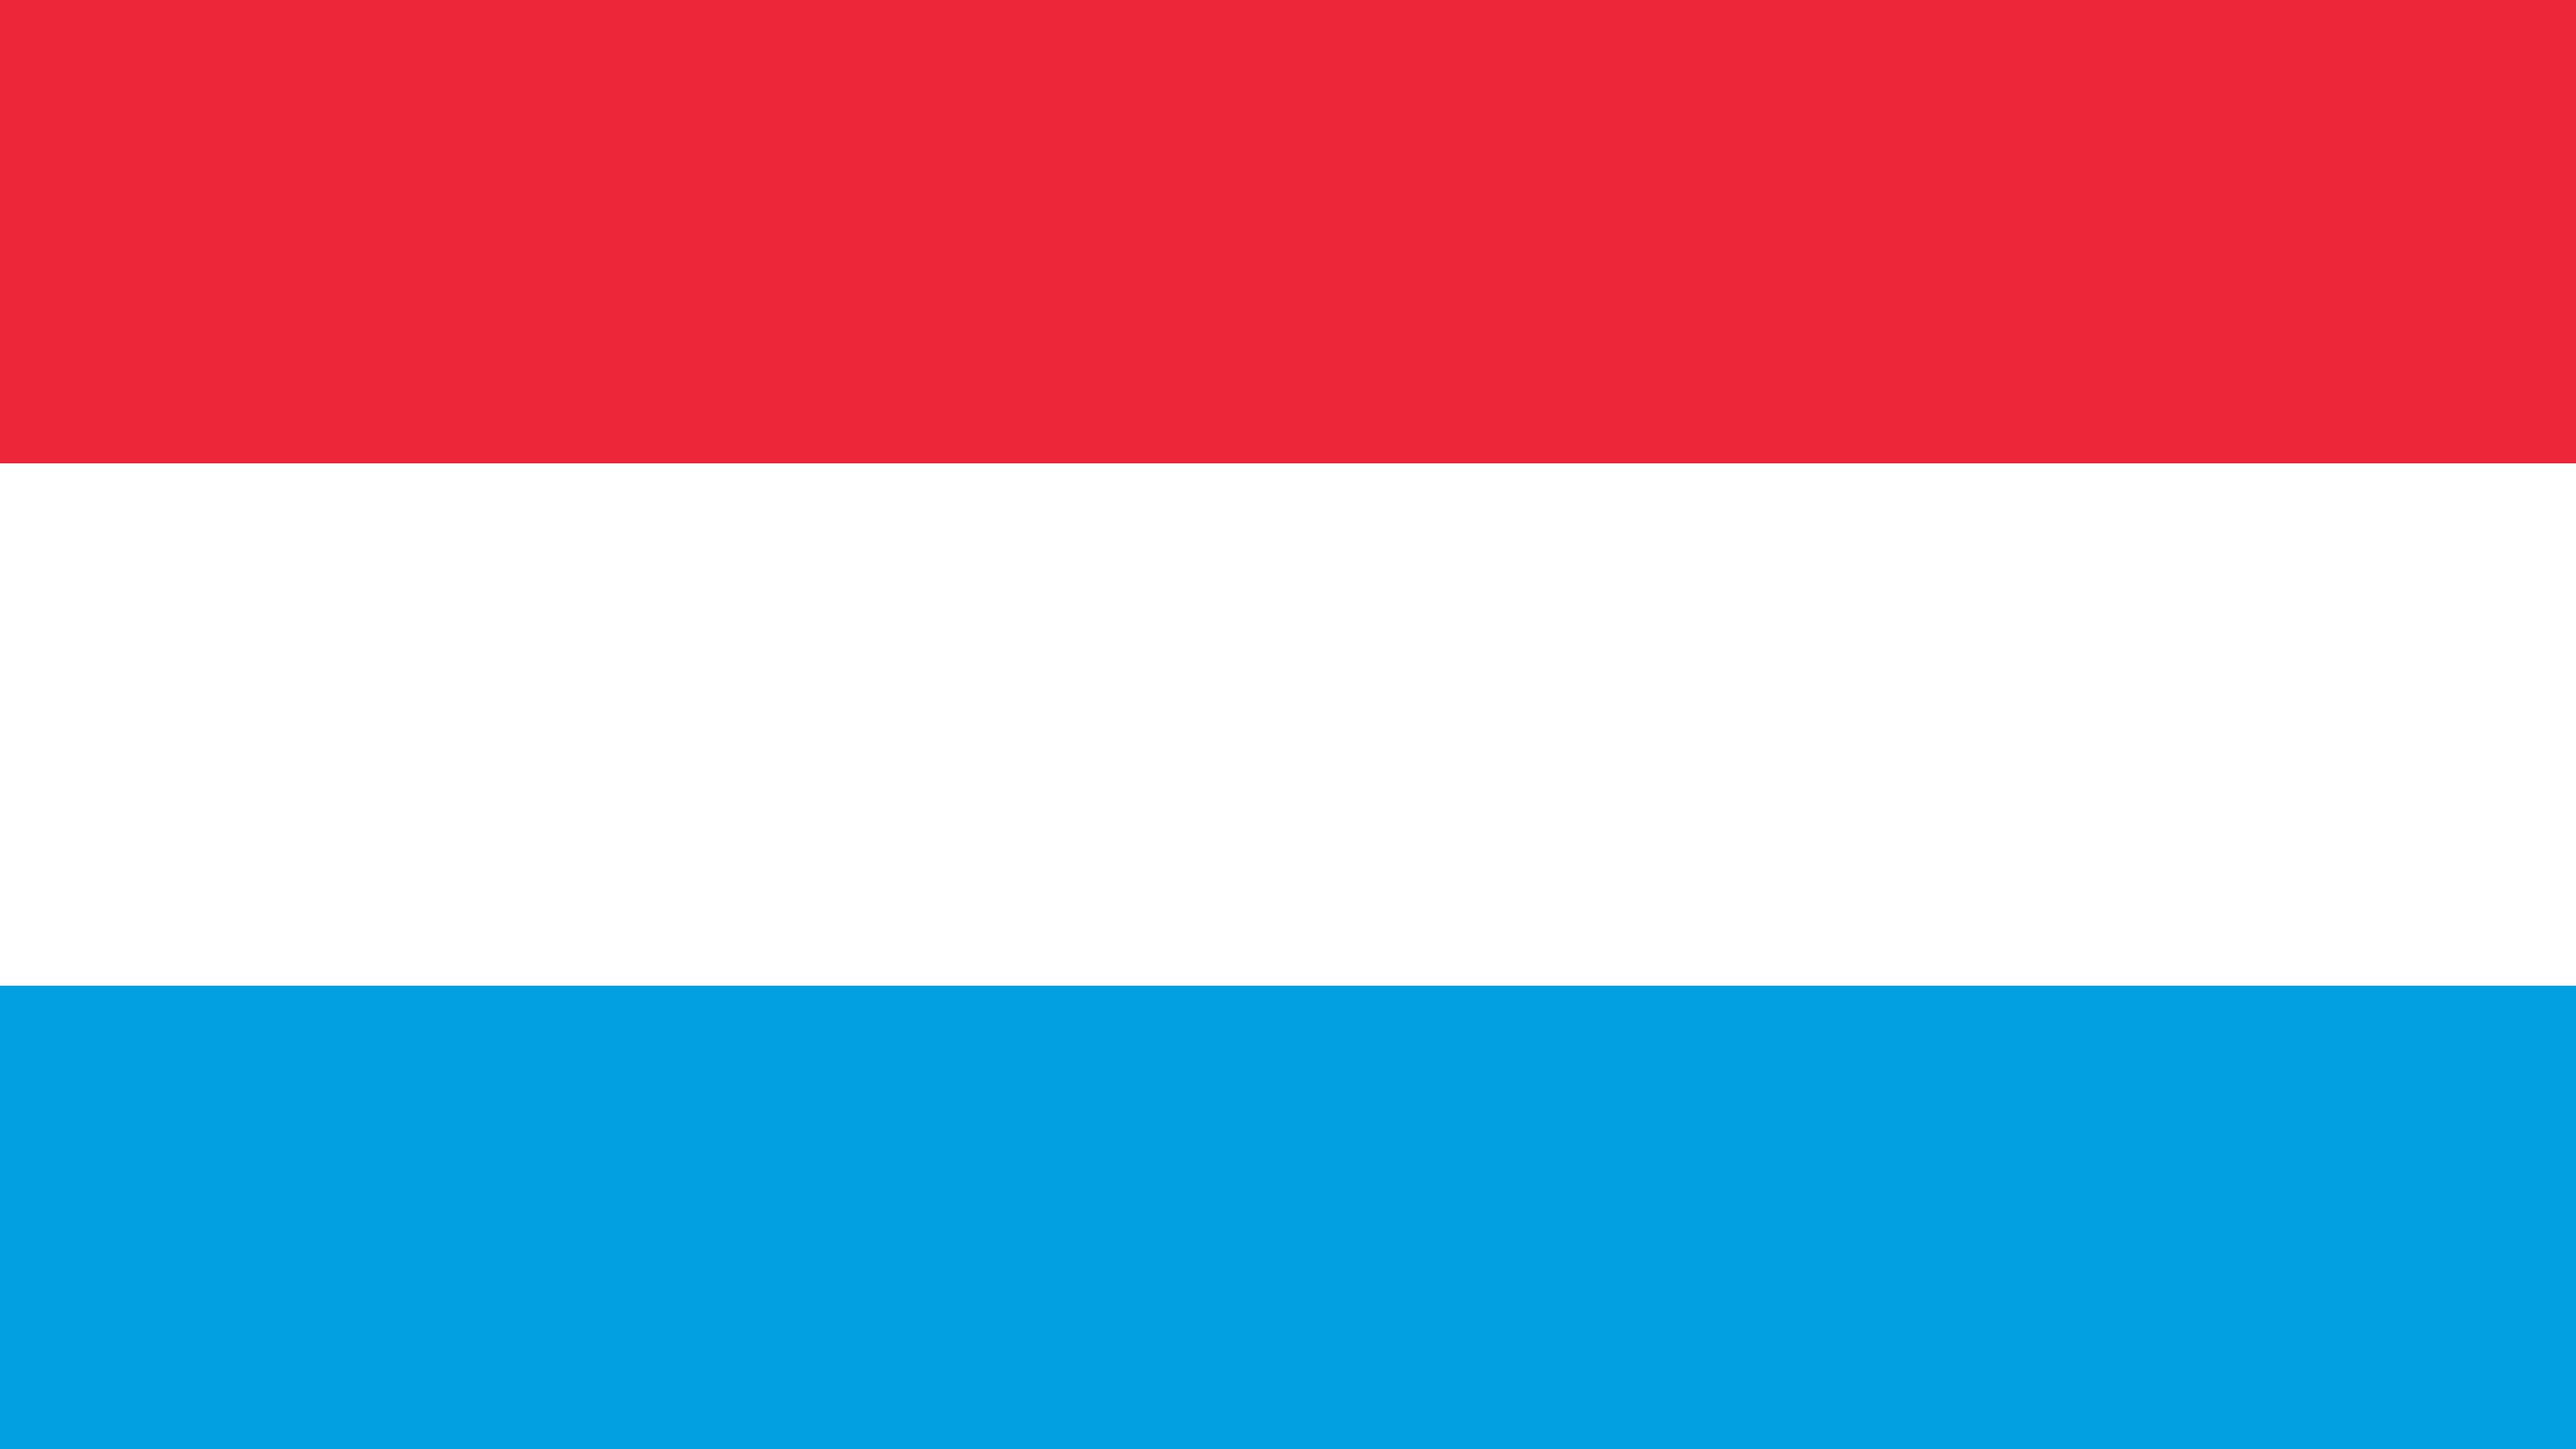 luxembourg flag uhd 4k wallpaper